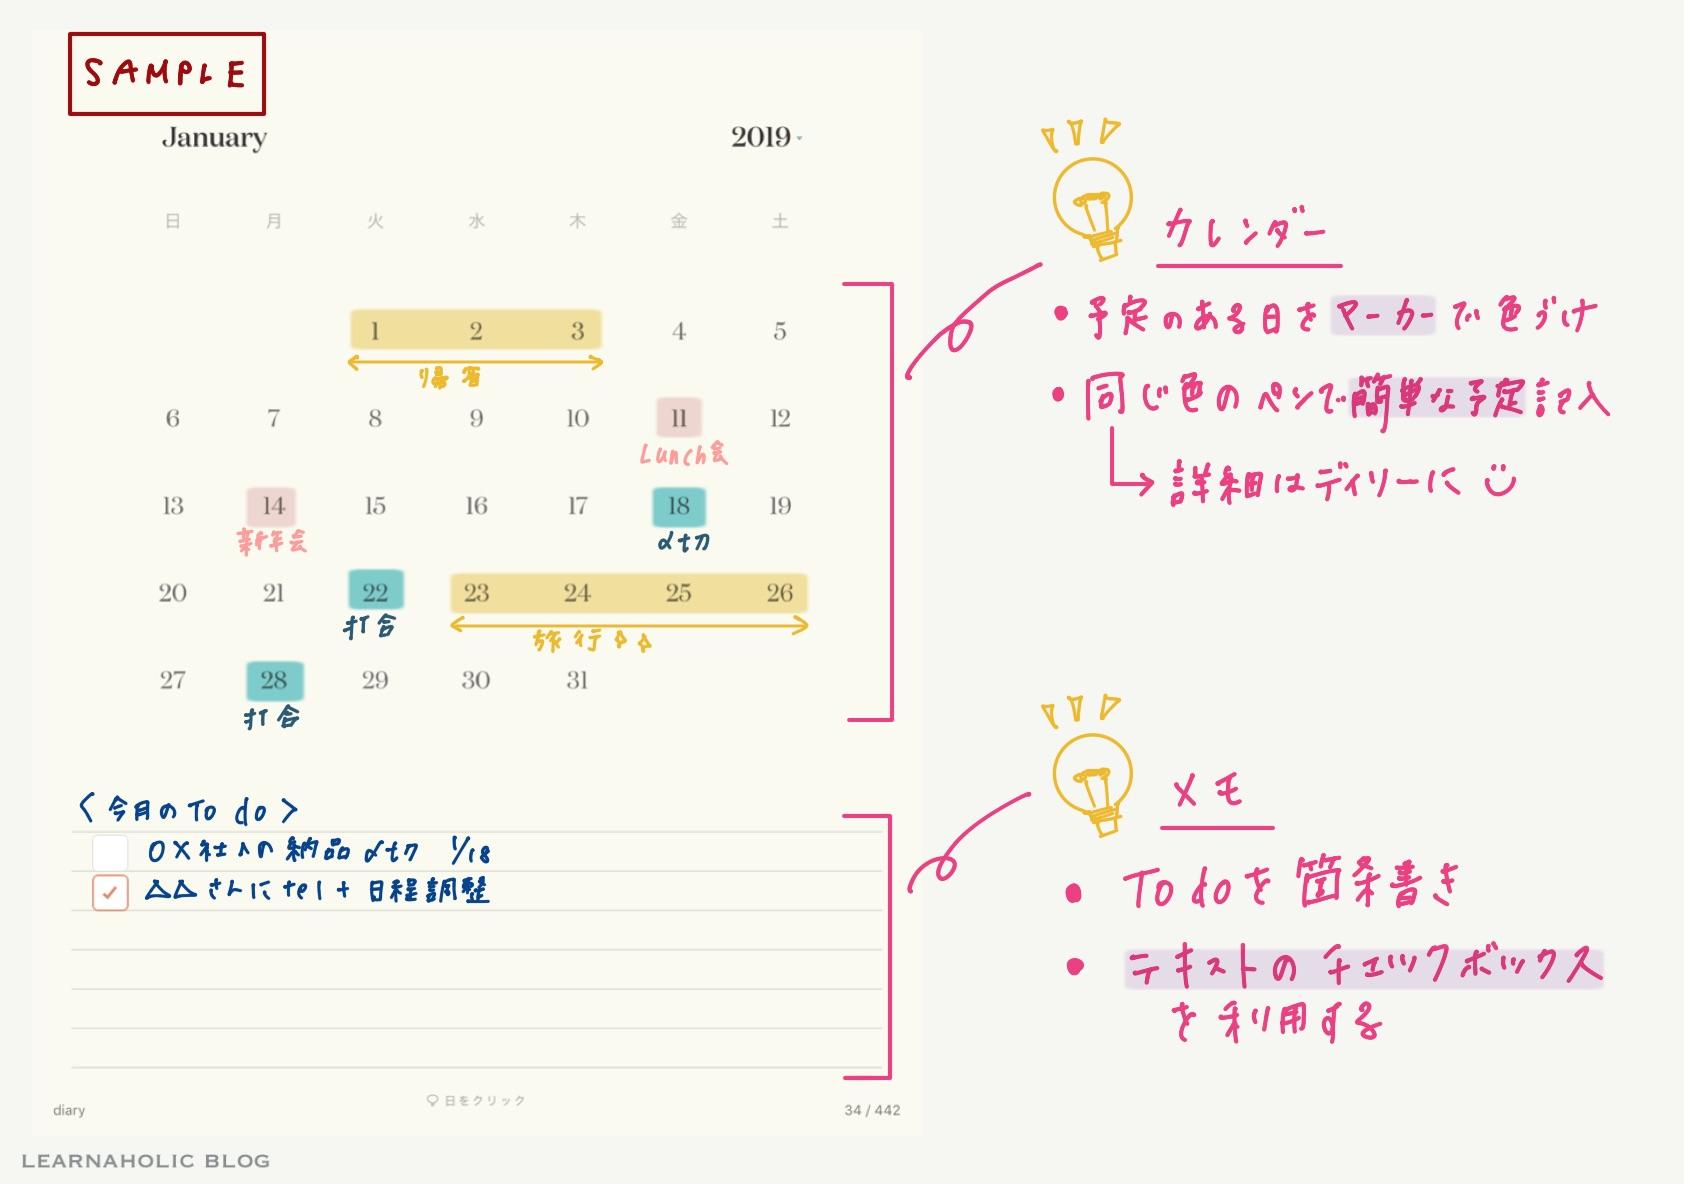 noteshelf2公式手帳テンプレート解説マンスリー